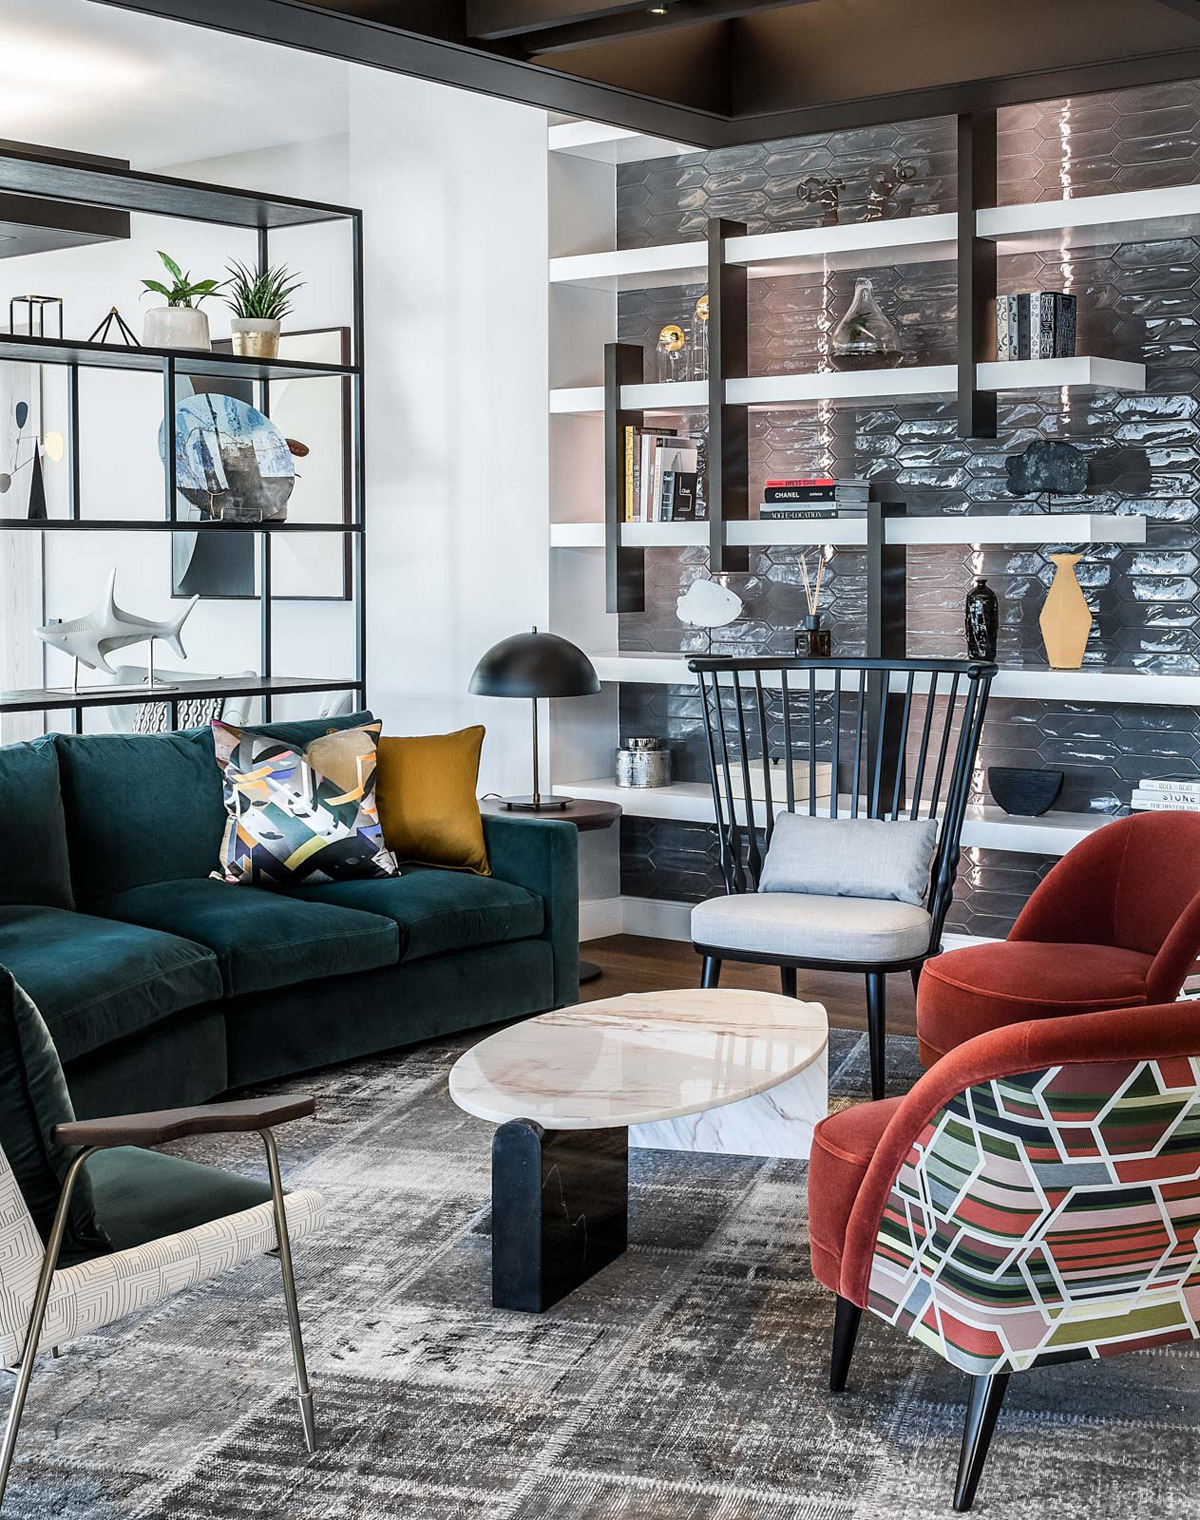 Angel O'Donnell Interiors for SBID Interior Design Blog (1)